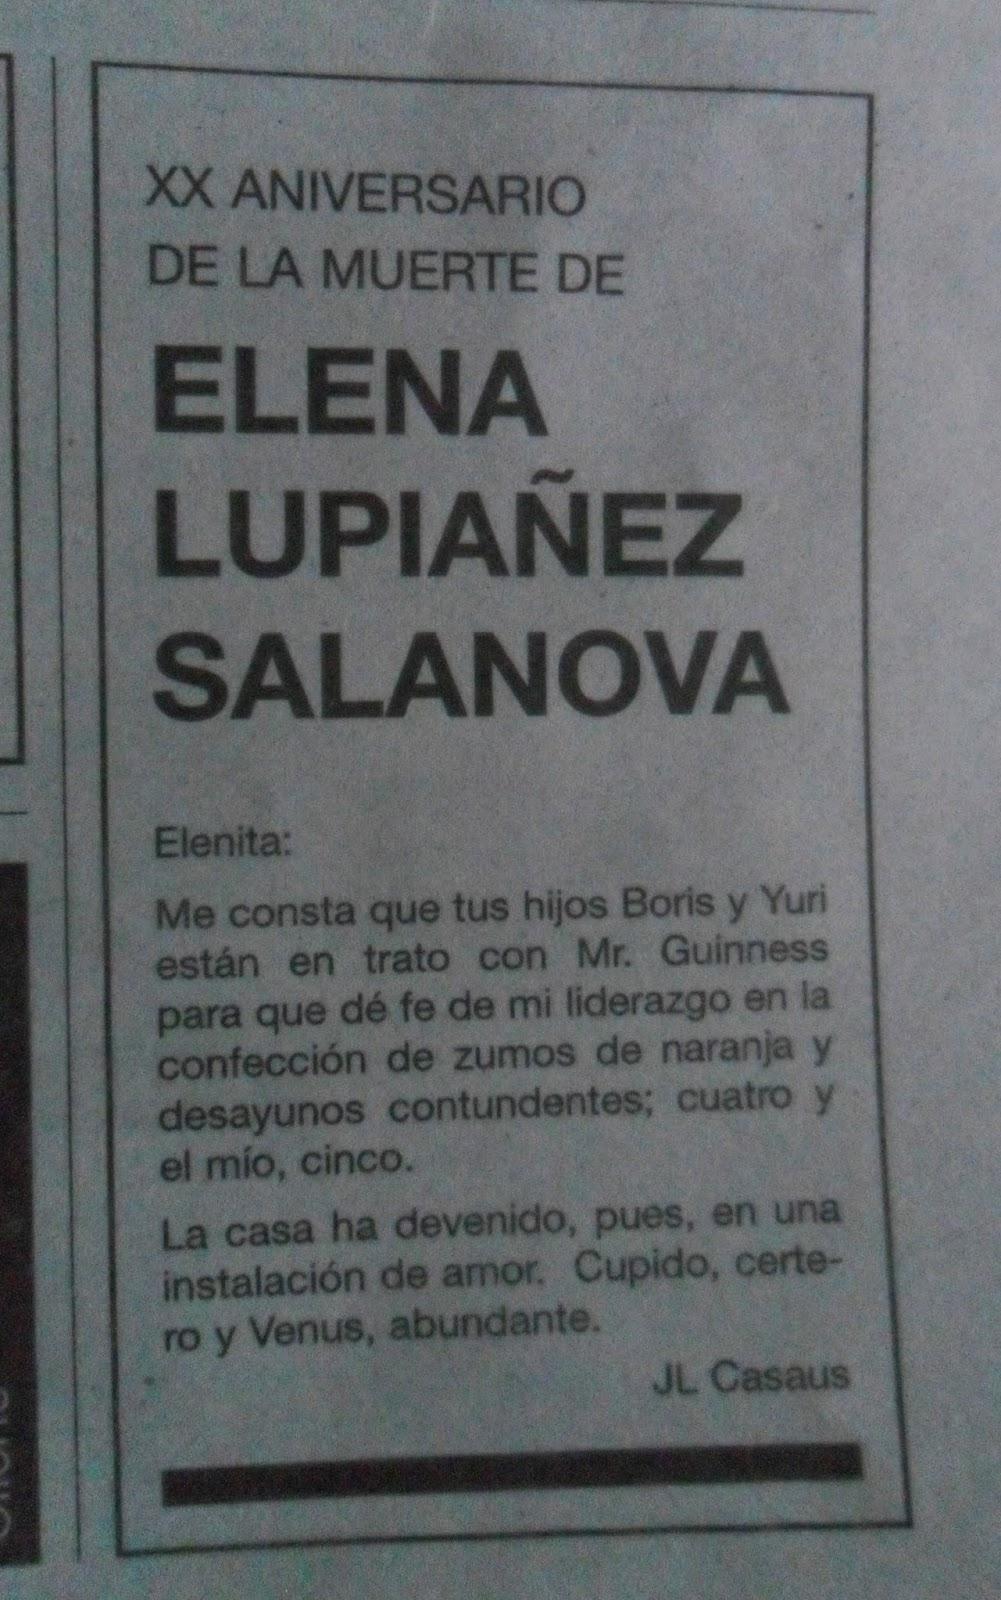 Elena Lupiáñez Salanova, José Luis Casaus, esquela, El País, vigésimo aniversario